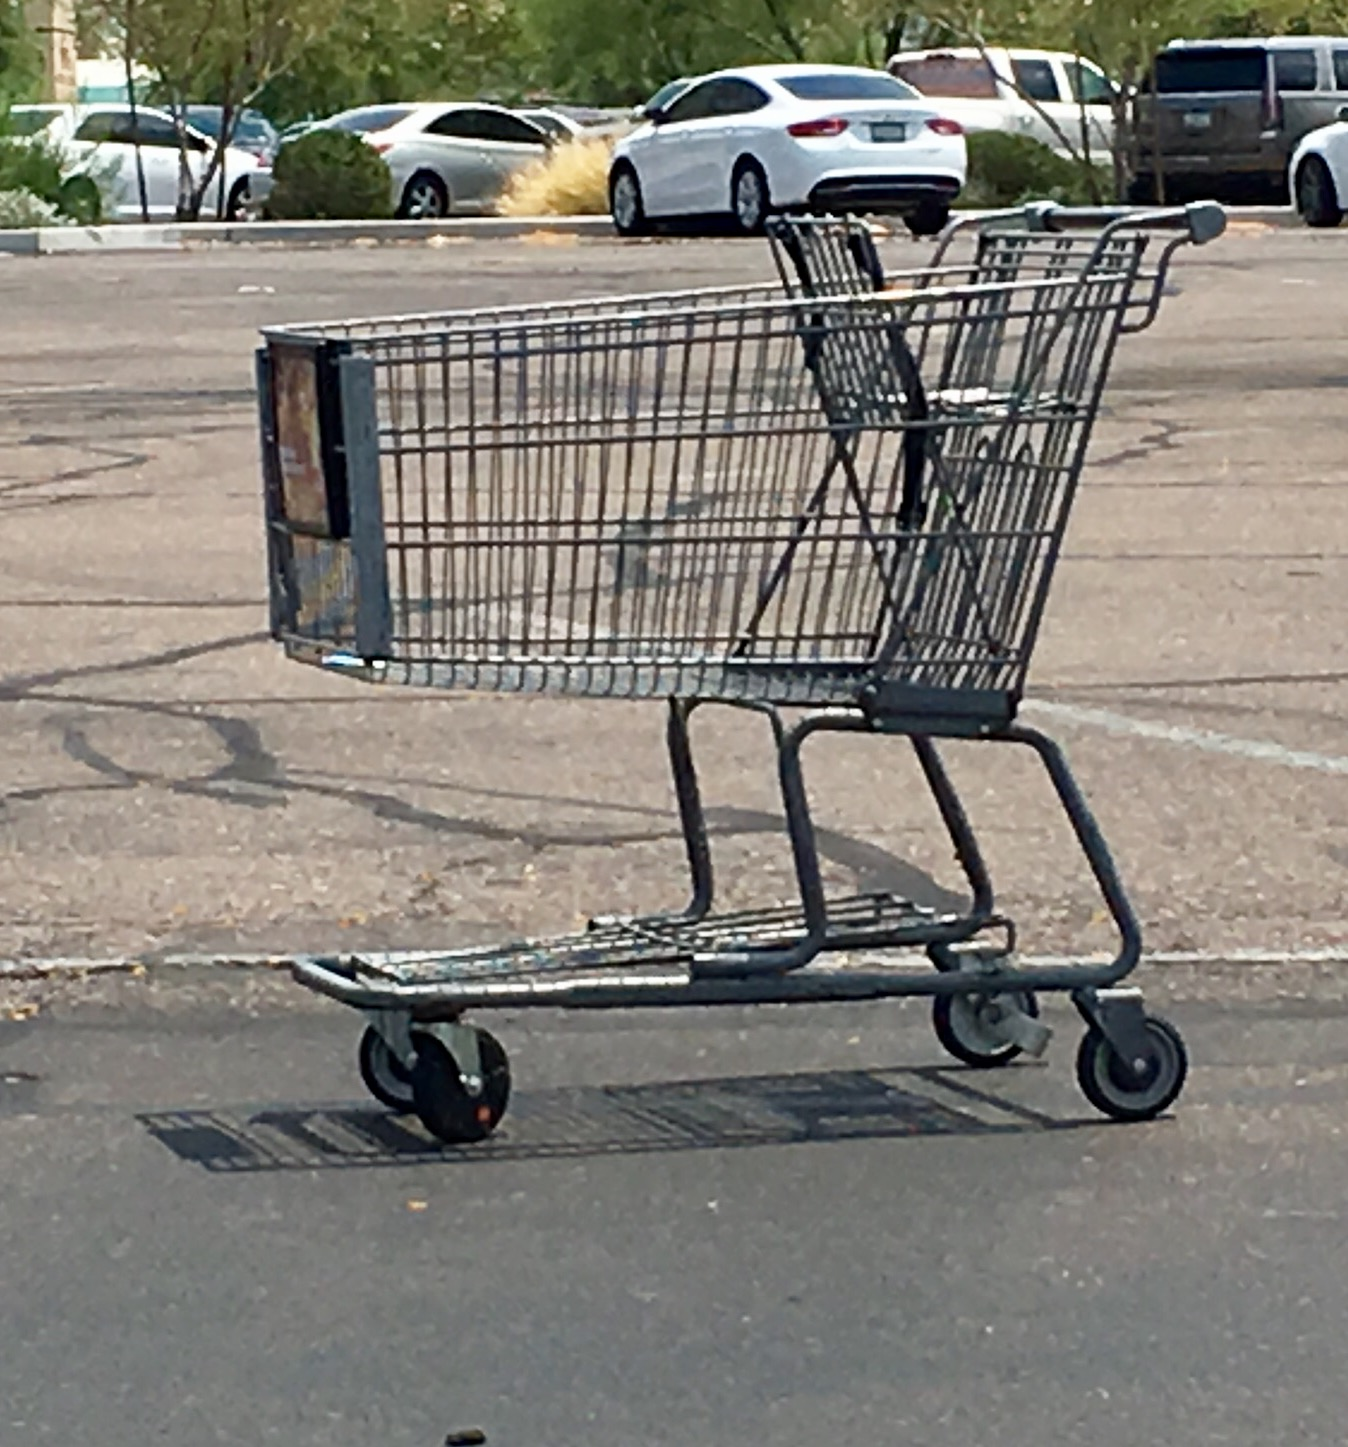 Phoenix Wants To Double Fee To Retrieve Shopping Carts | KJZZ